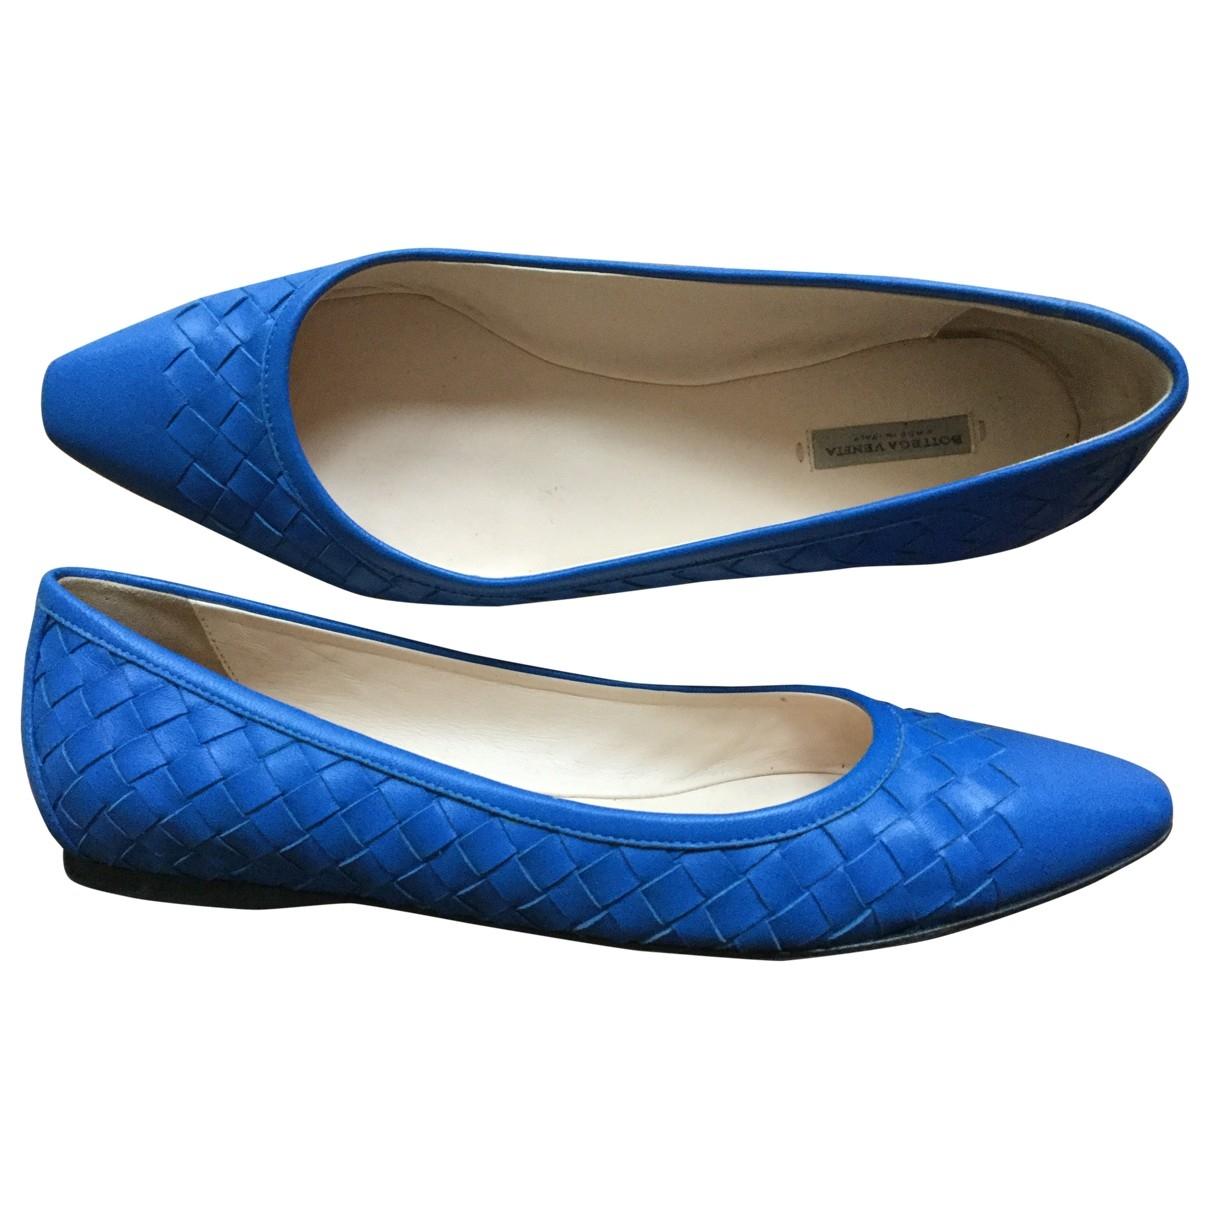 Bottega Veneta \N Blue Leather Ballet flats for Women 37 EU